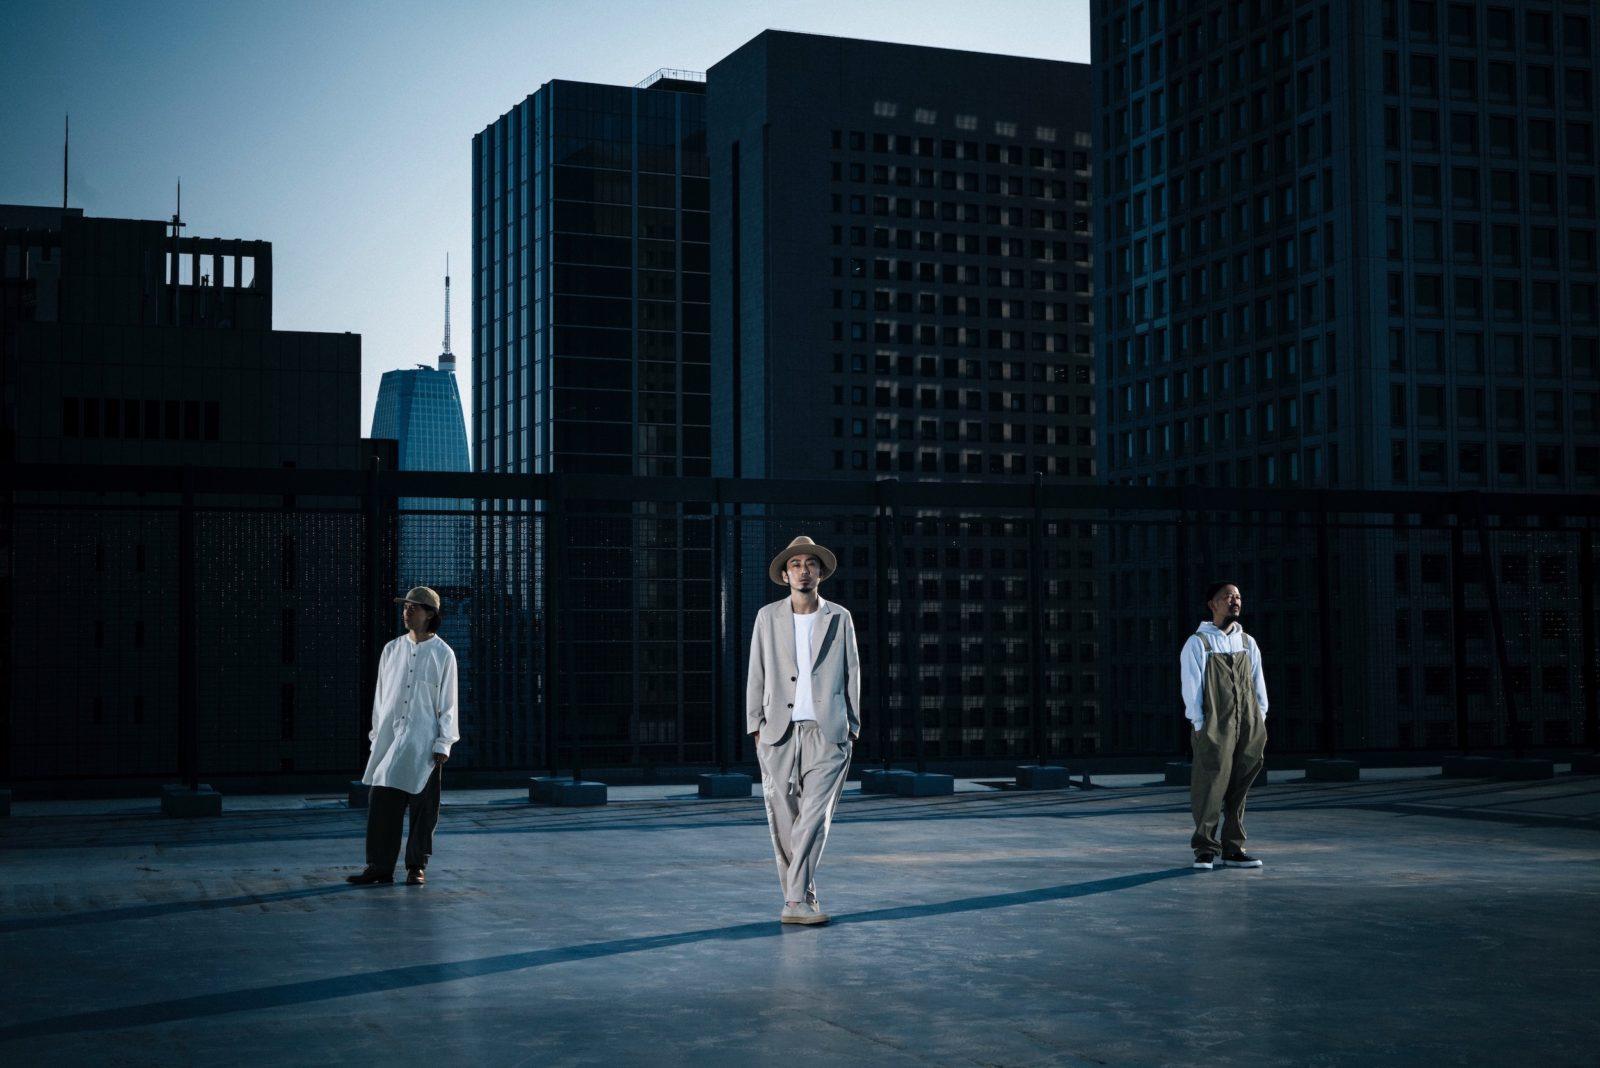 ACIDMAN、約3年ぶりとなるニューシングル『灰色の街』詳細発表サムネイル画像!